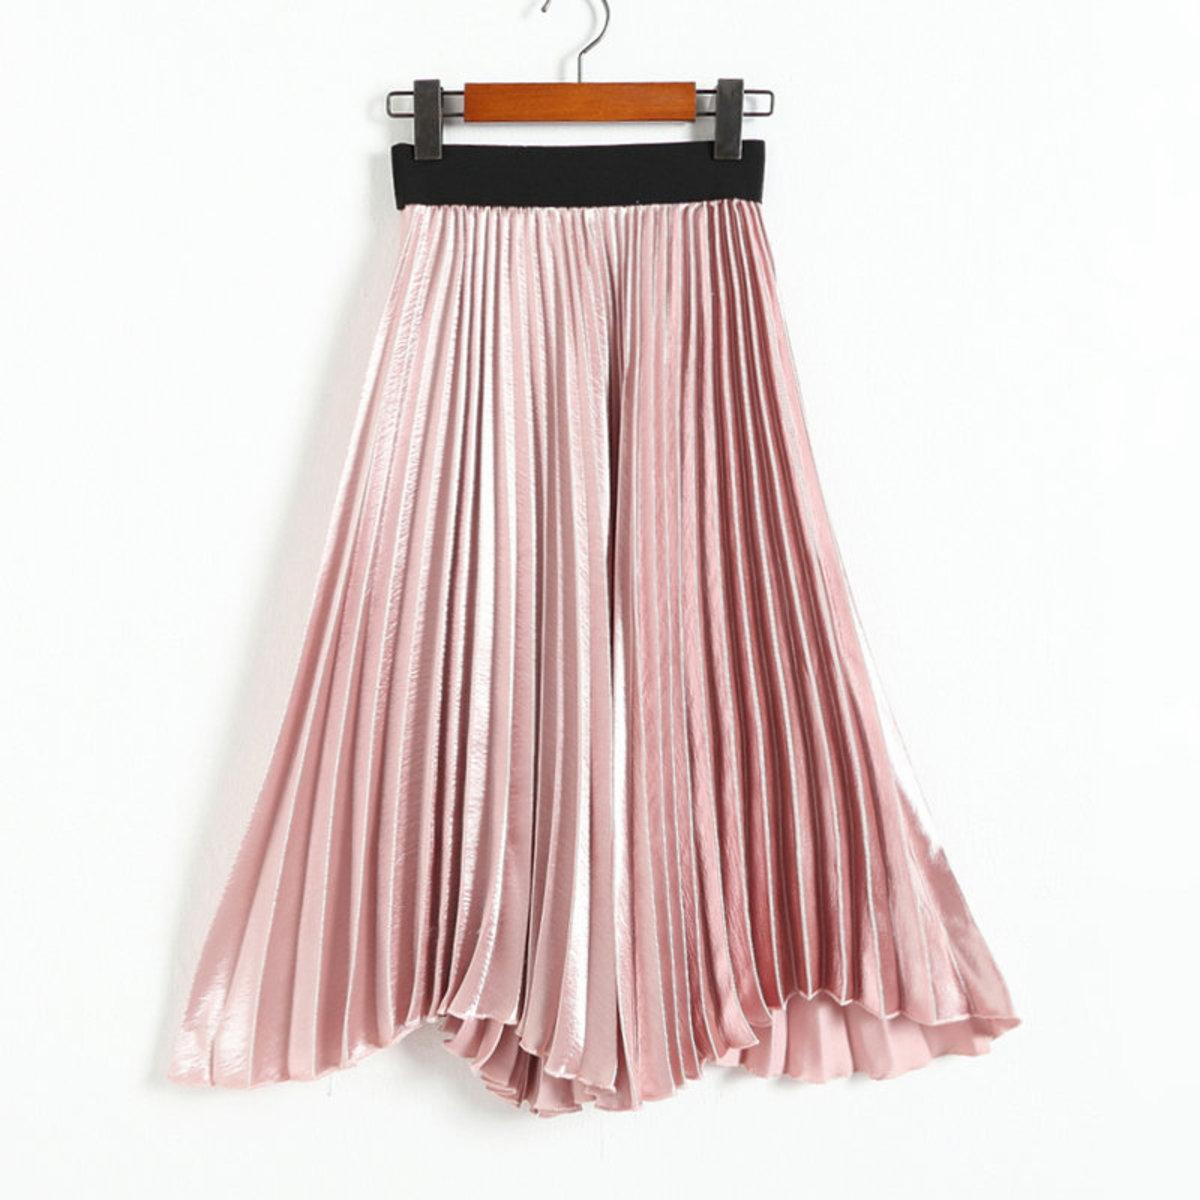 Fashion Skirt 2017